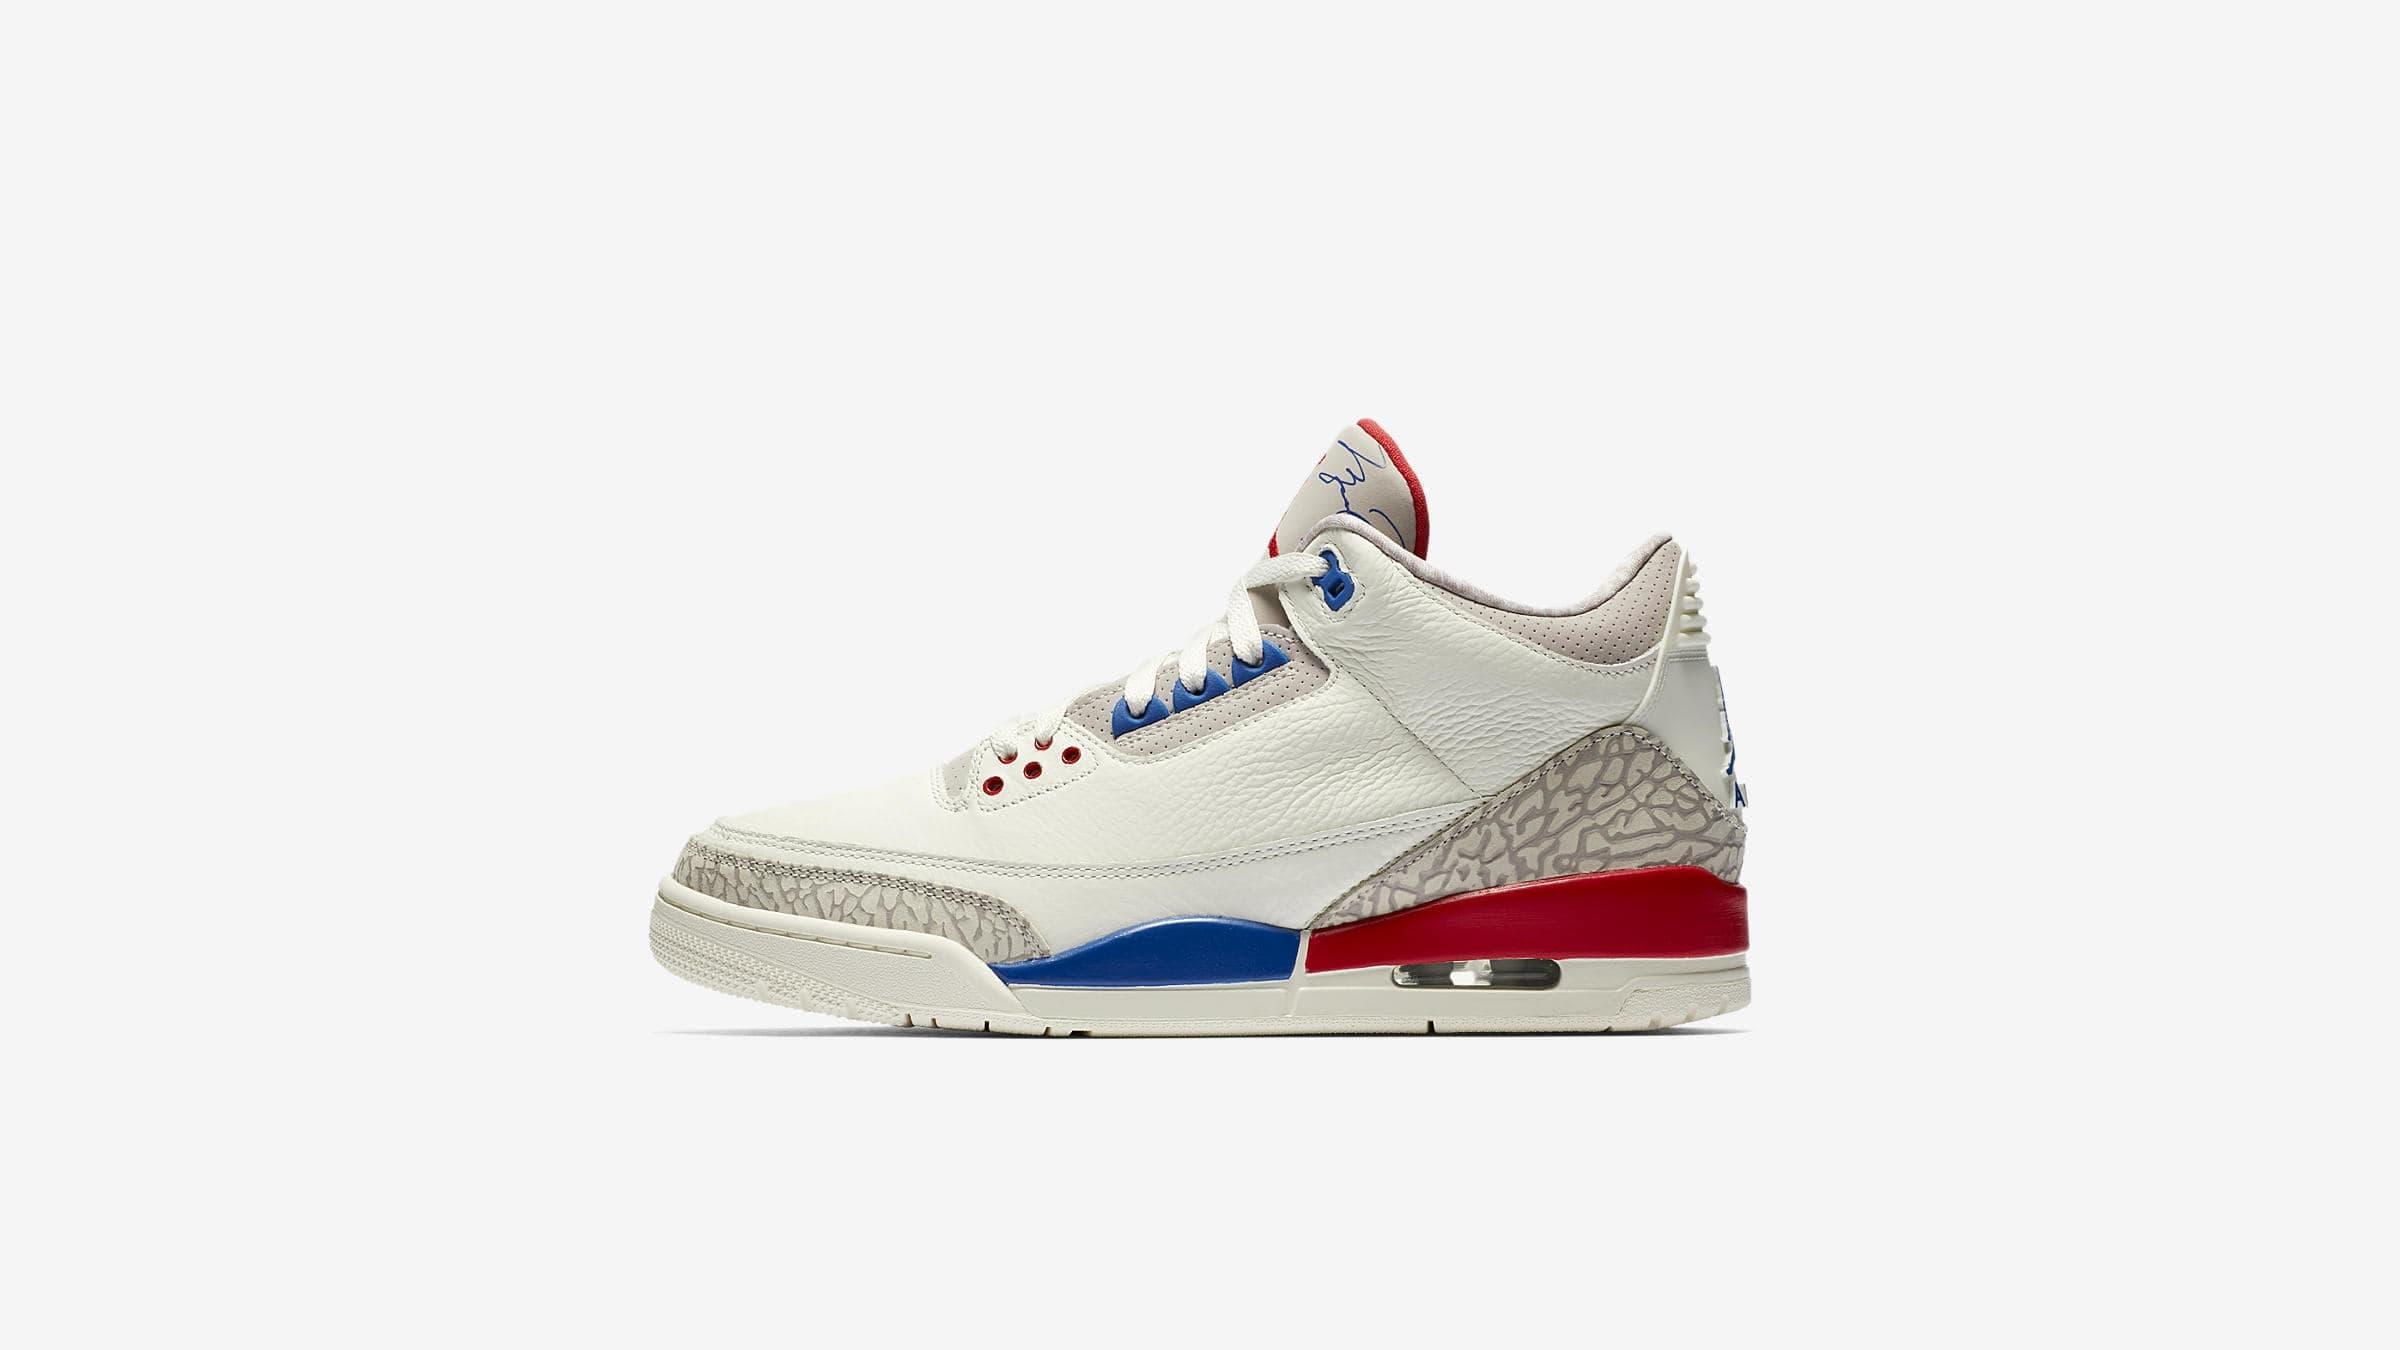 finest selection 231ef 56d84 END. Features | Nike Air Jordan 3 Retro 'International ...